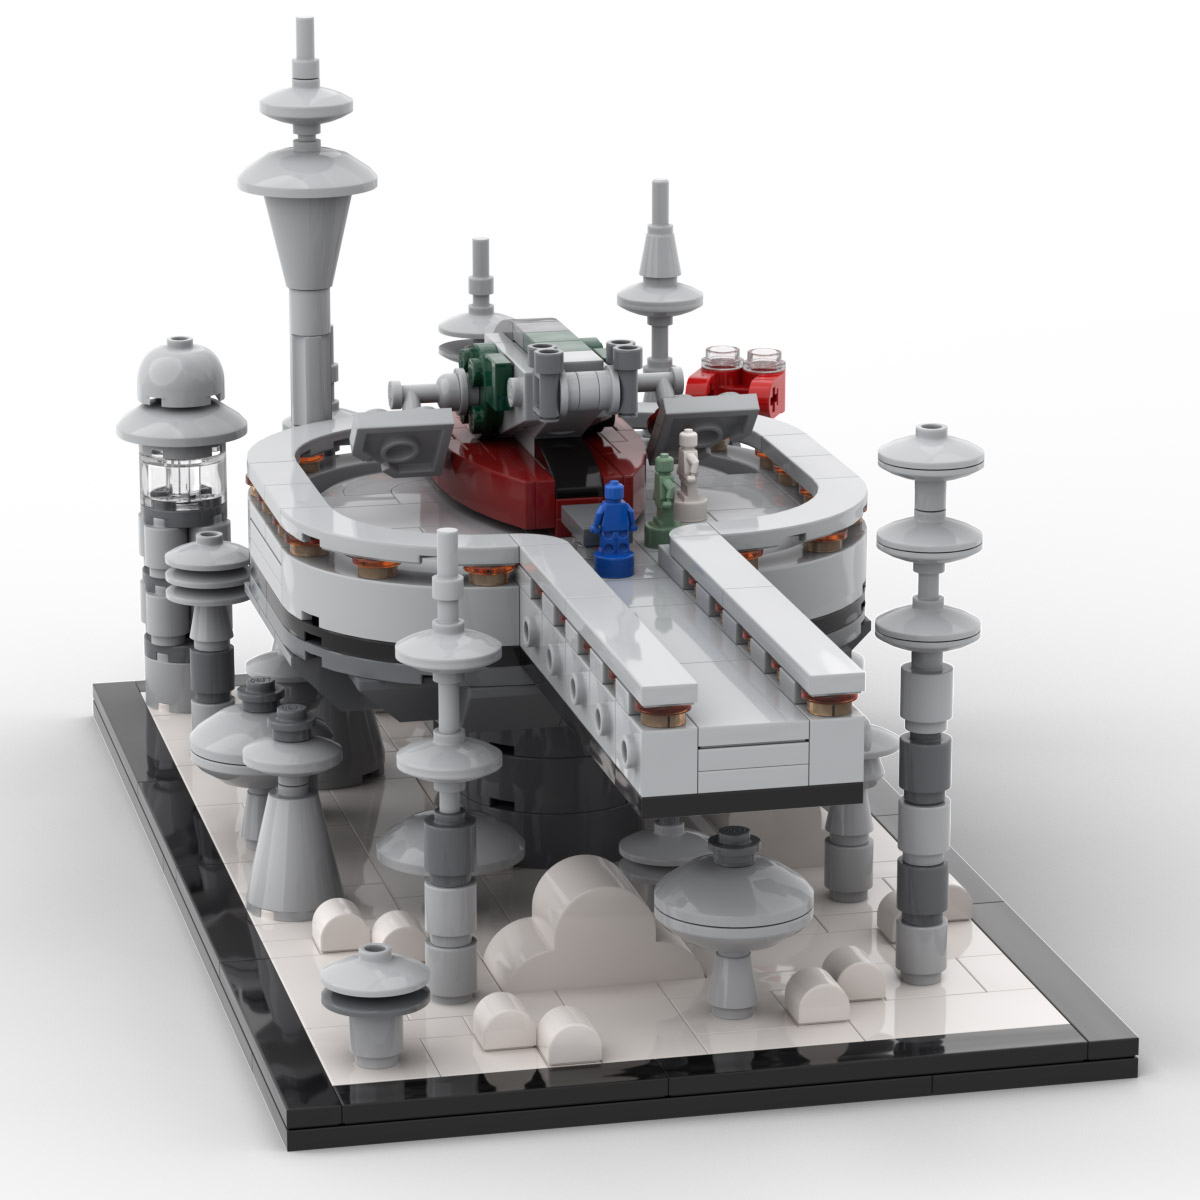 Lego Star Wars Cloud City Slave 1 Display Set